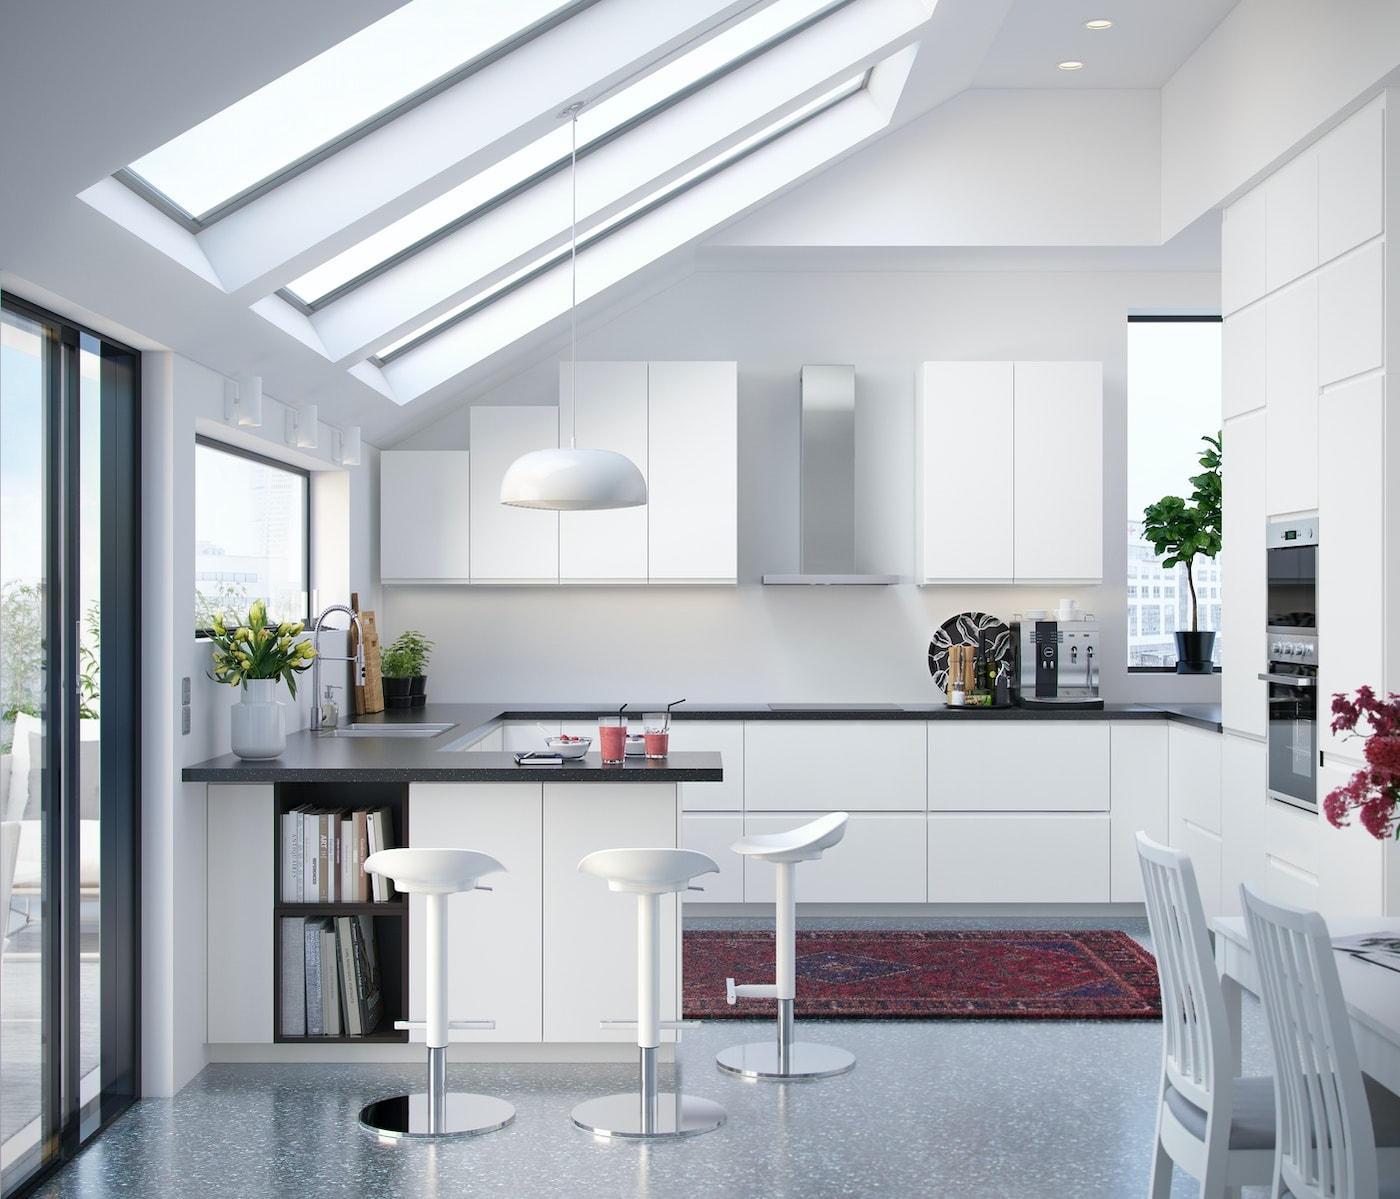 IKEA VOXTORP kitchen